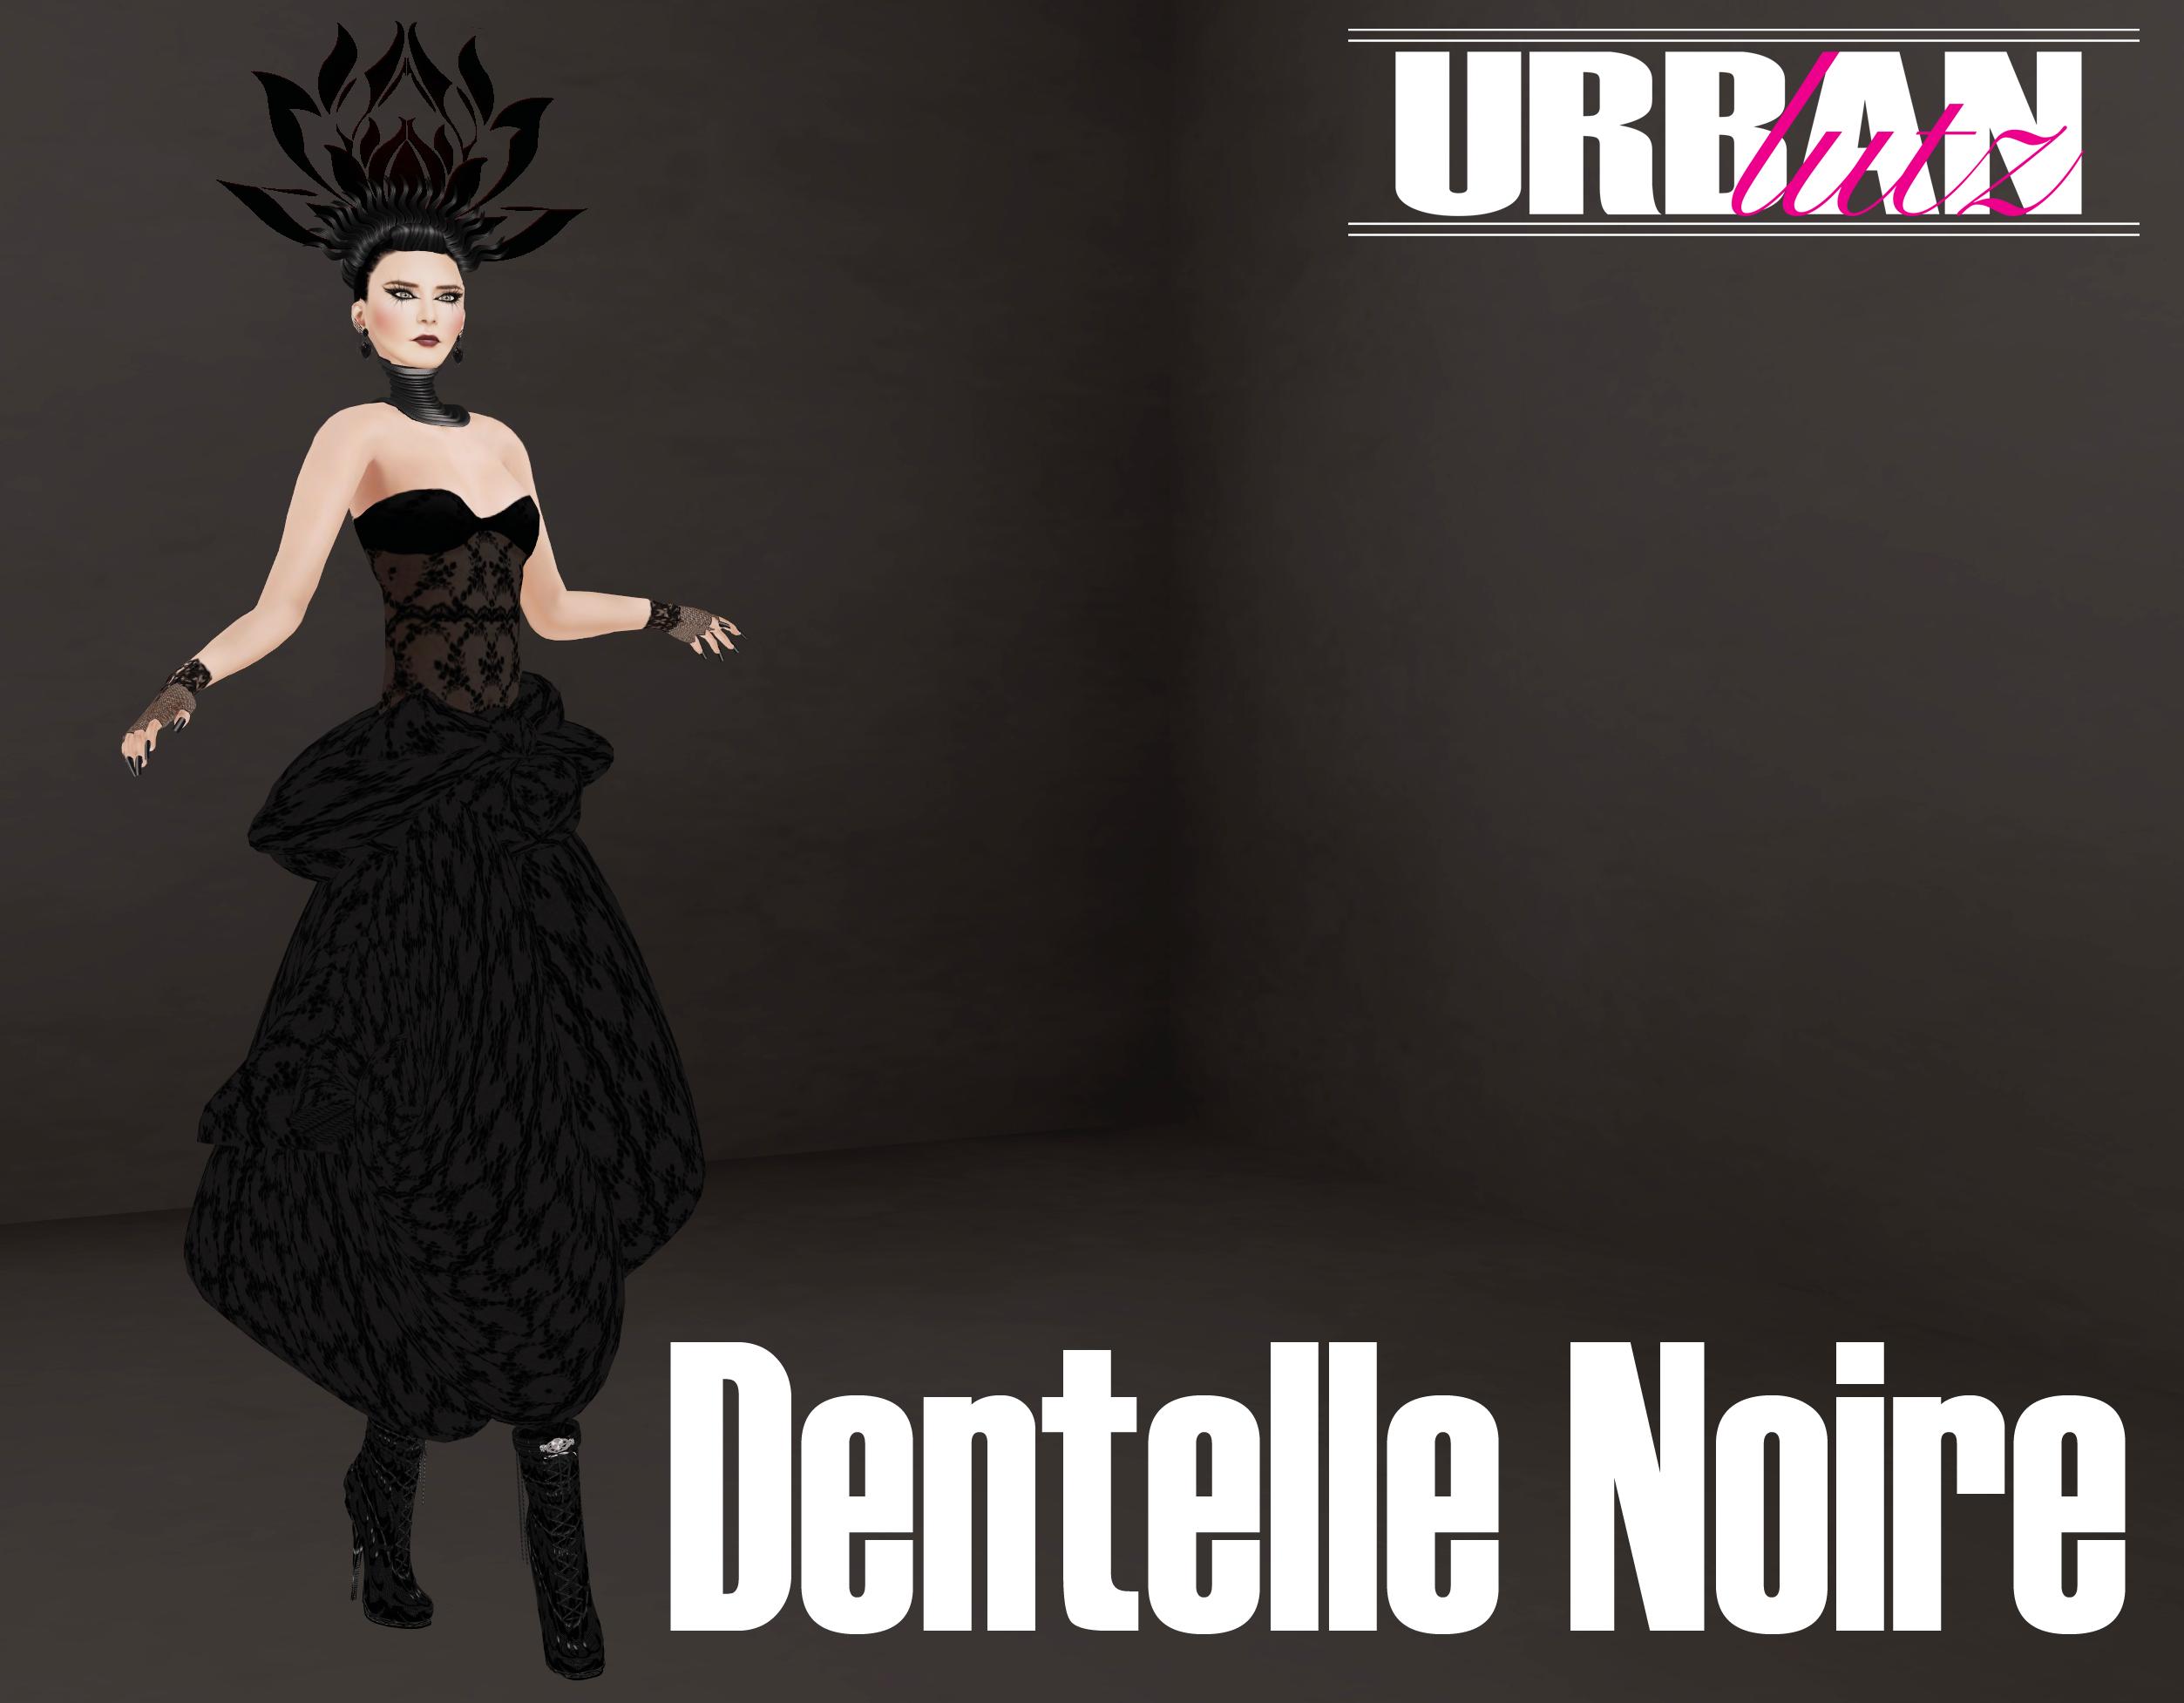 UrbanLutz Haus - Dentelle Noire